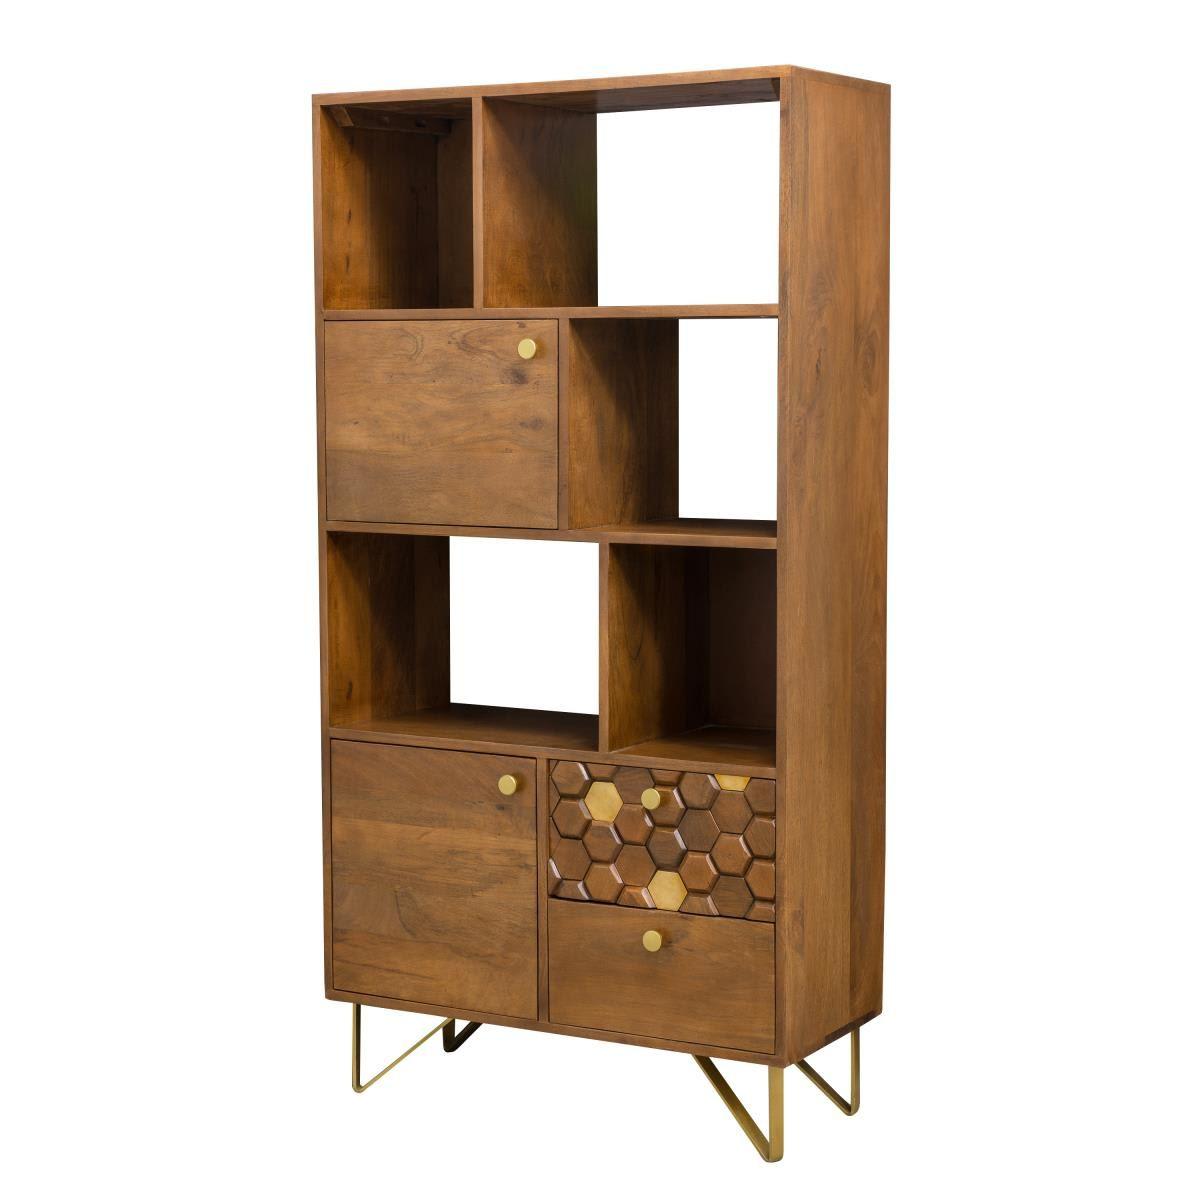 The Unit, Shelves, Trade Furniture